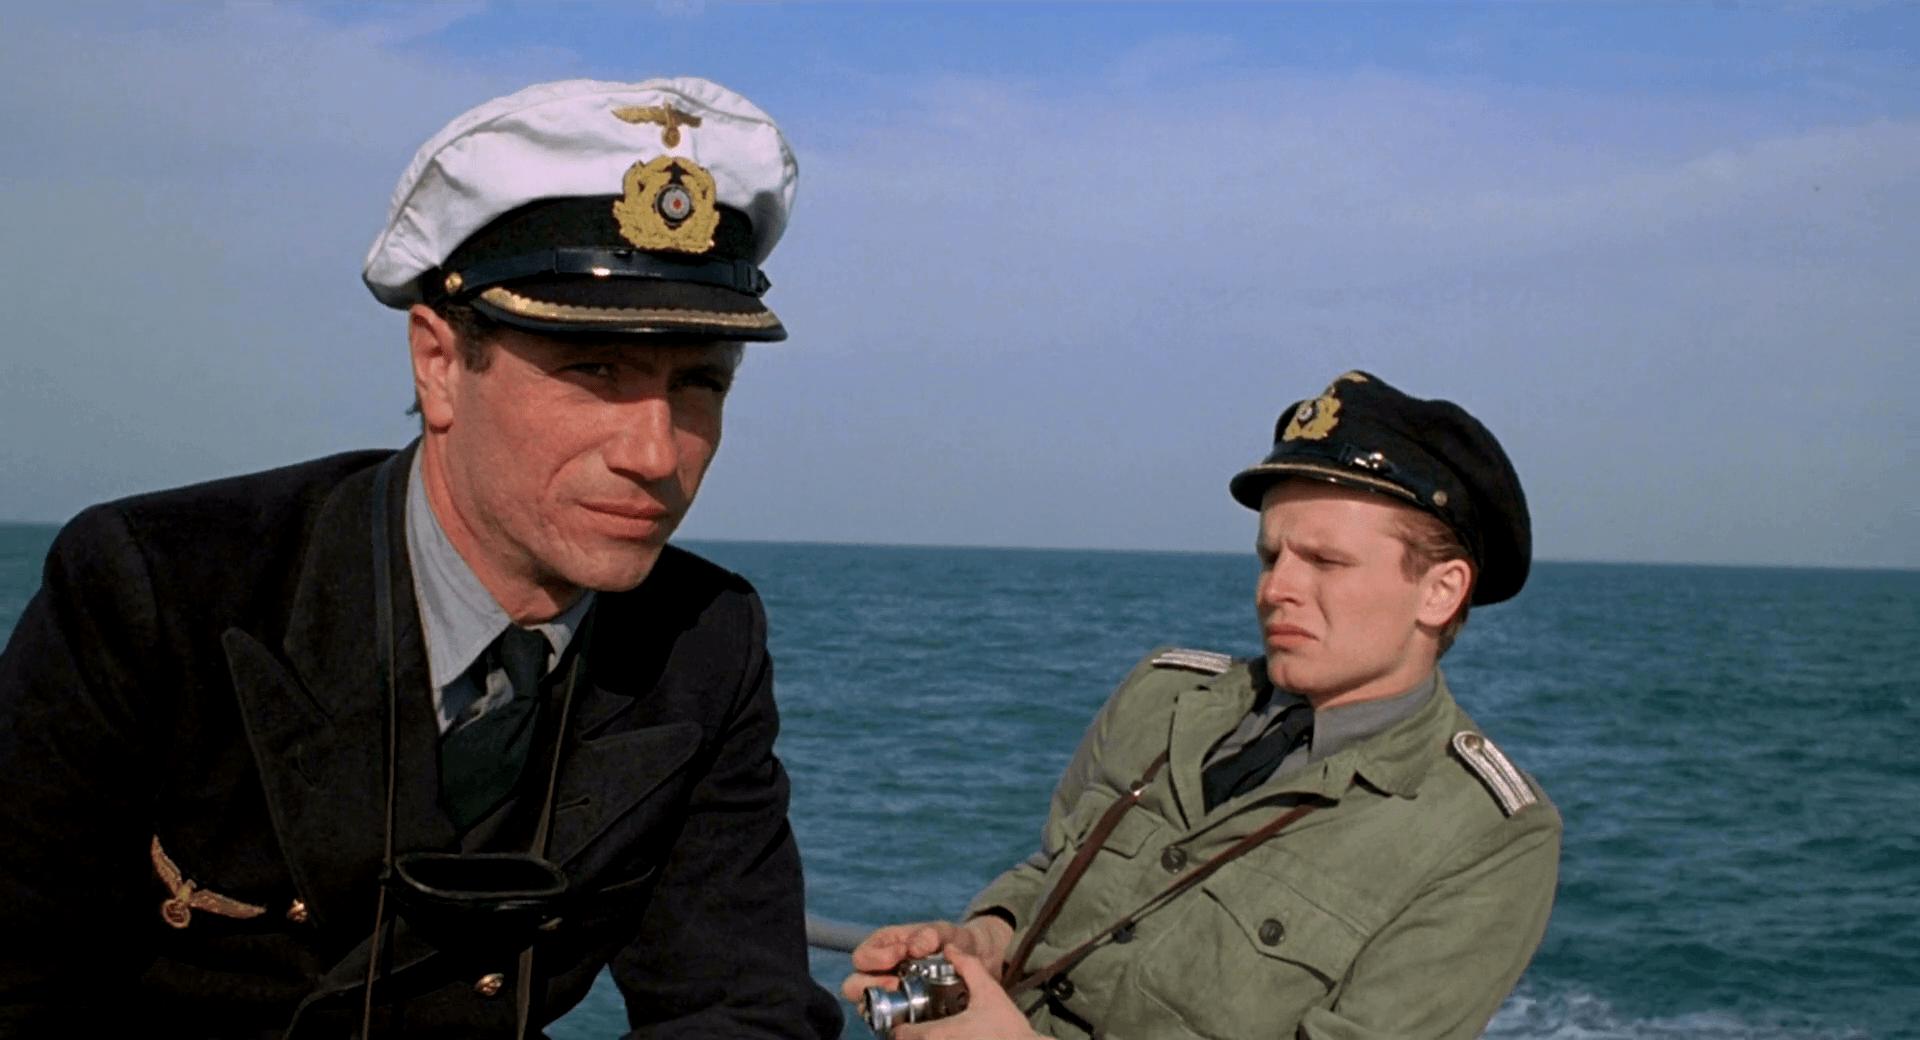 u-boot-96-film